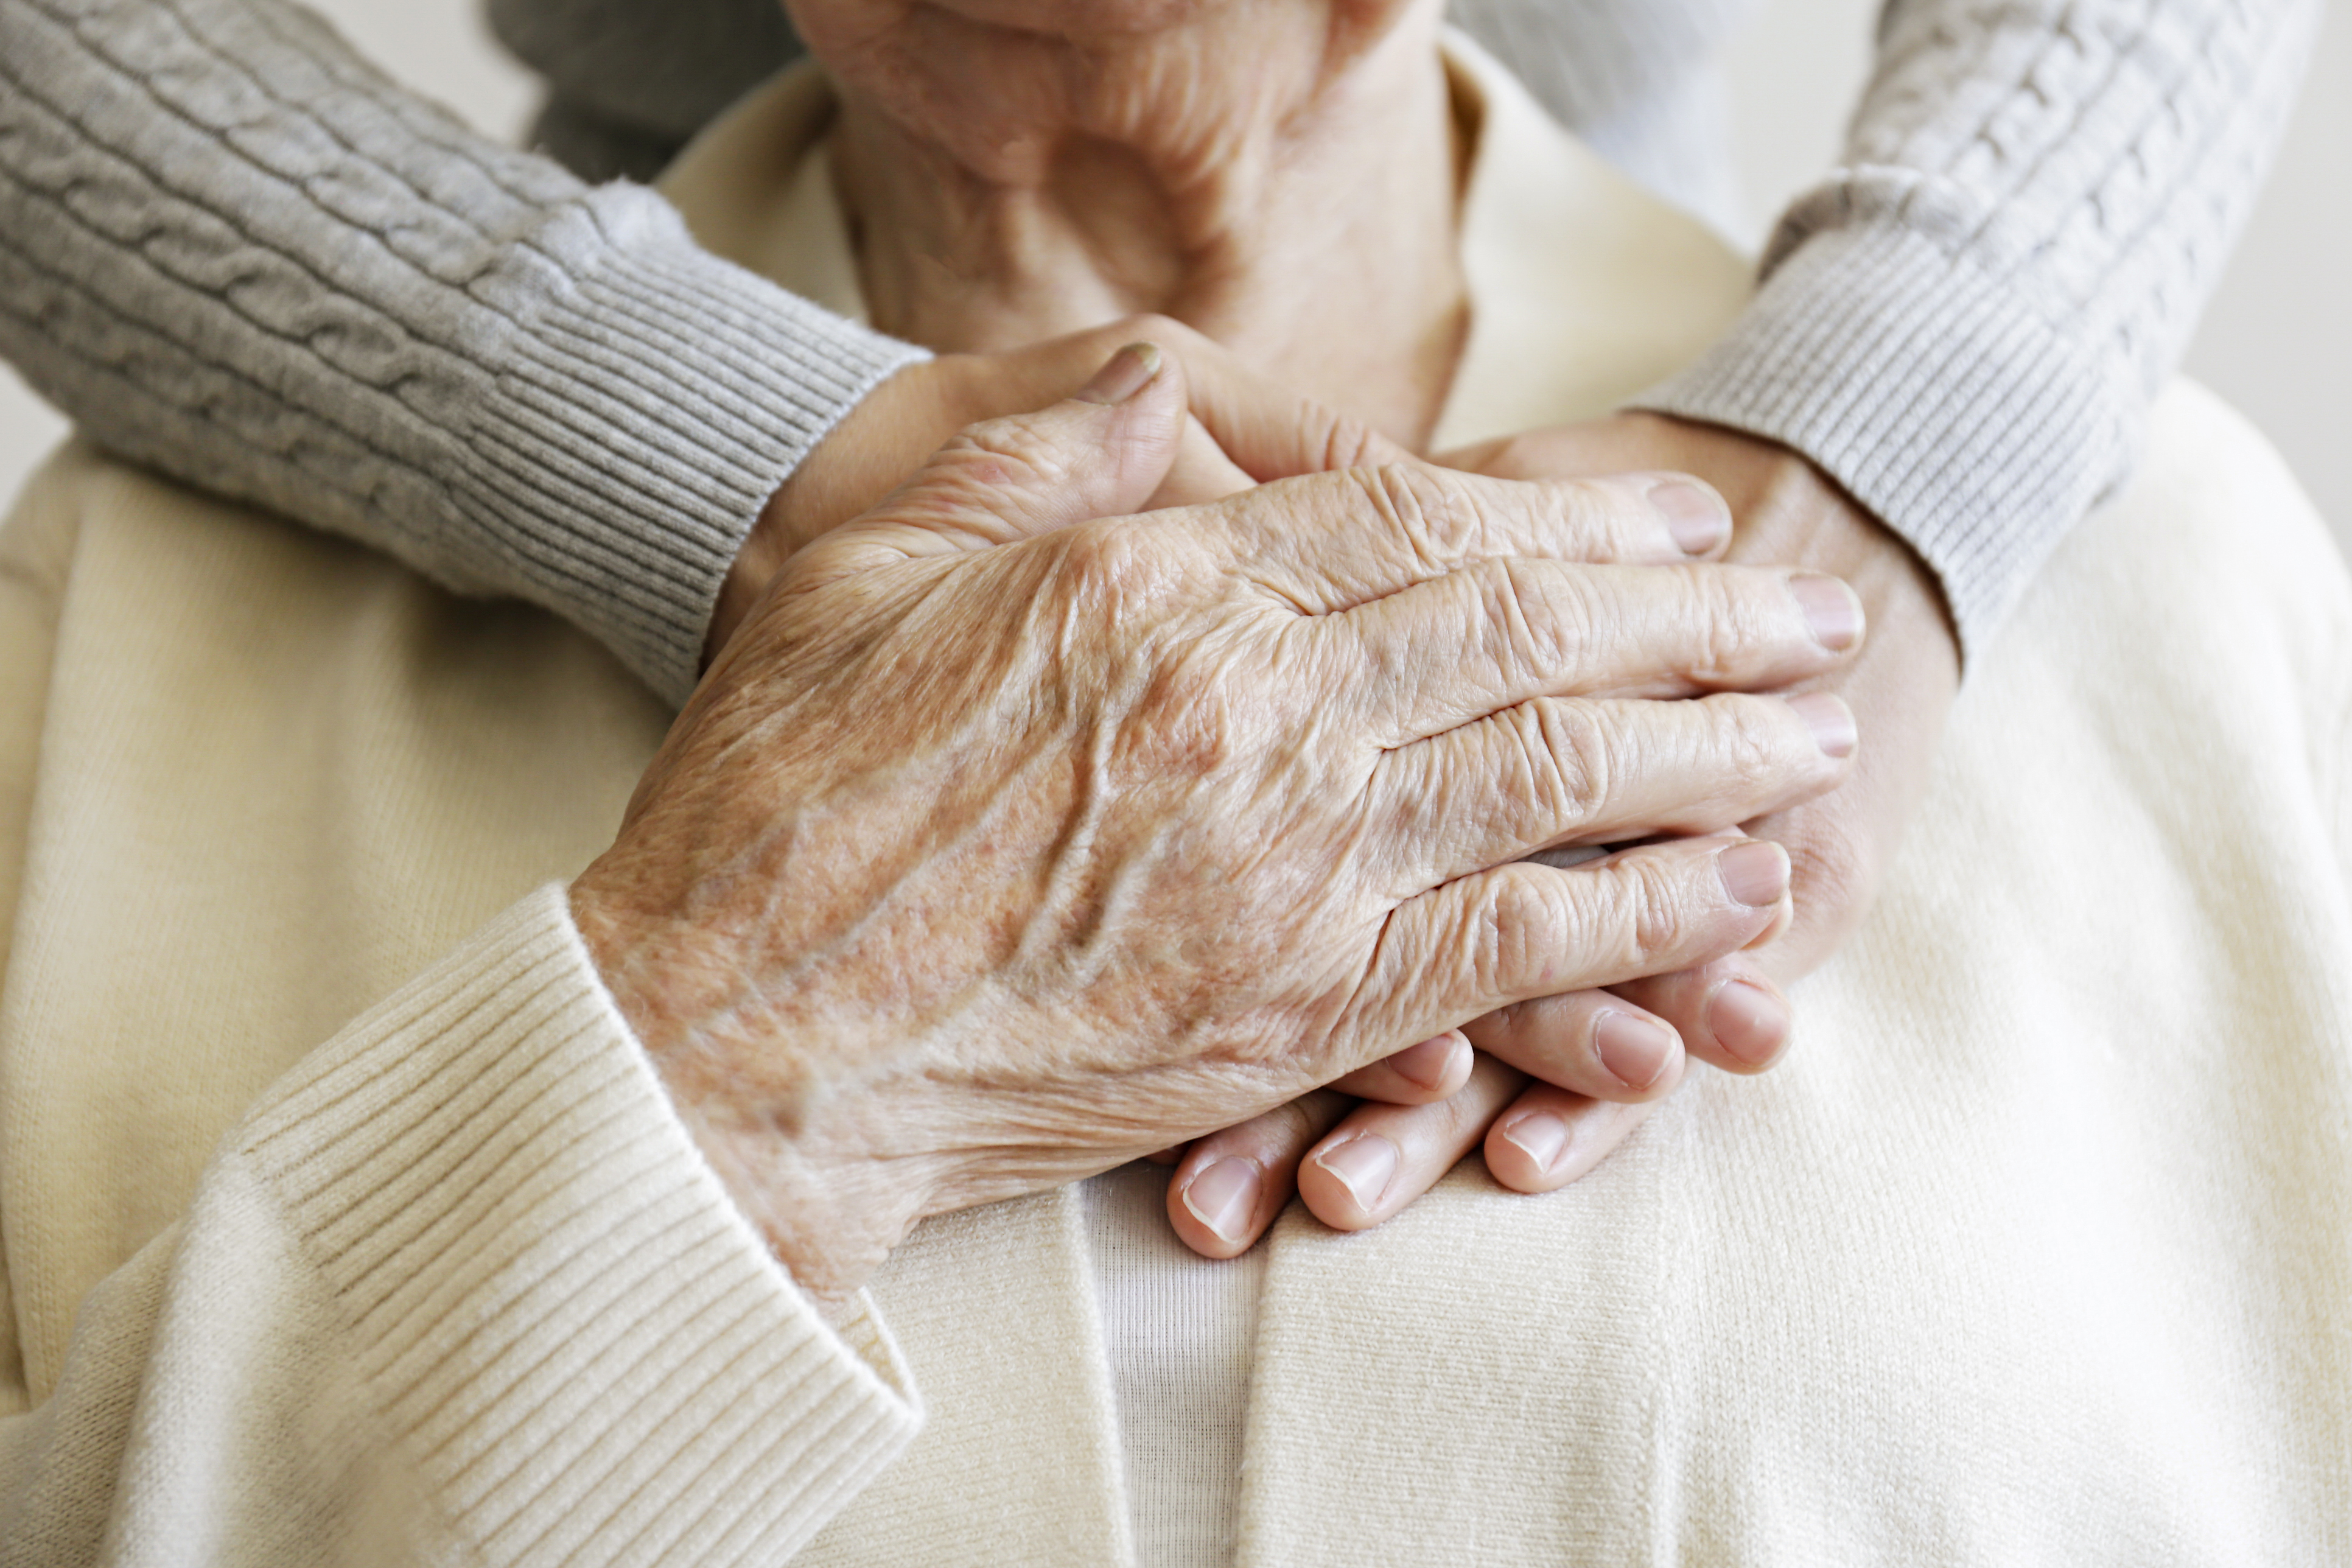 Family Caregiver Support link